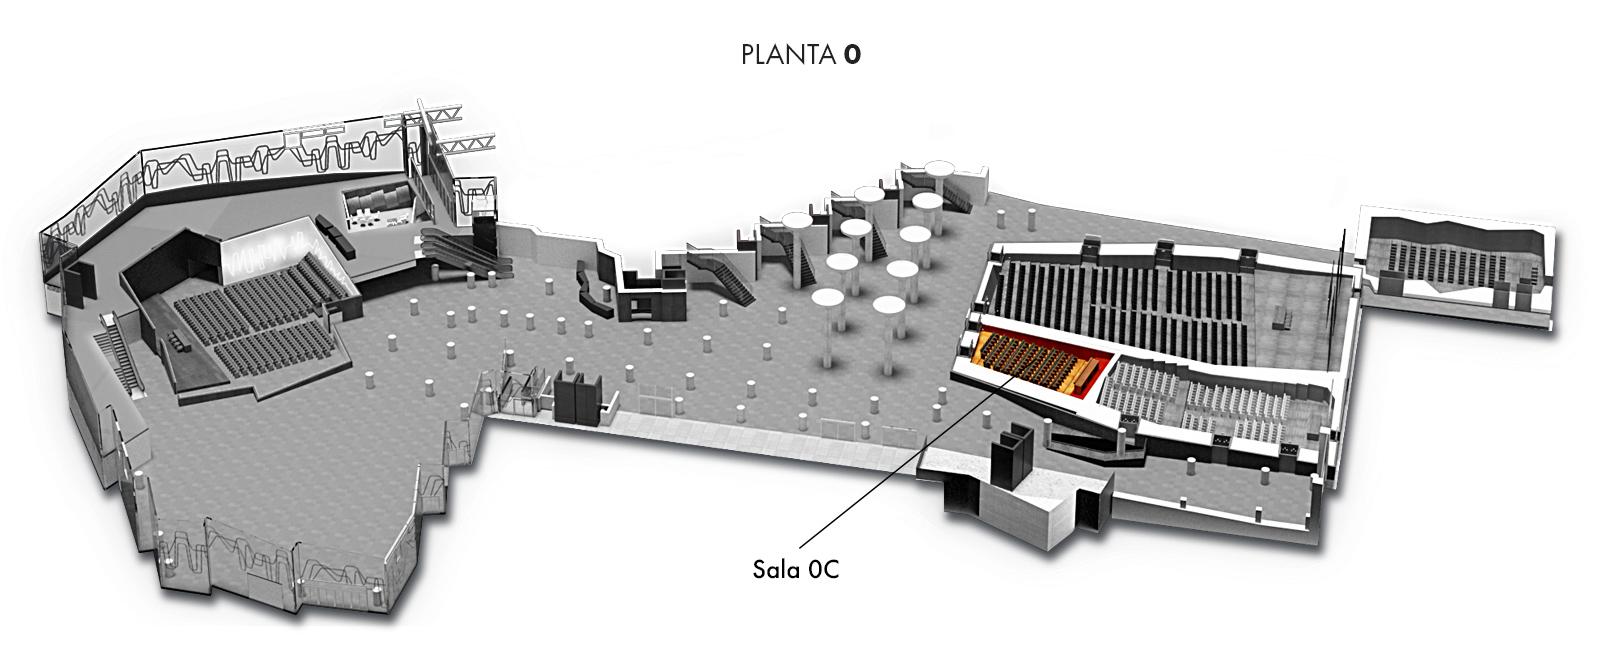 Sala 0C, Planta 0 | Palacio Euskalduna Jauregia